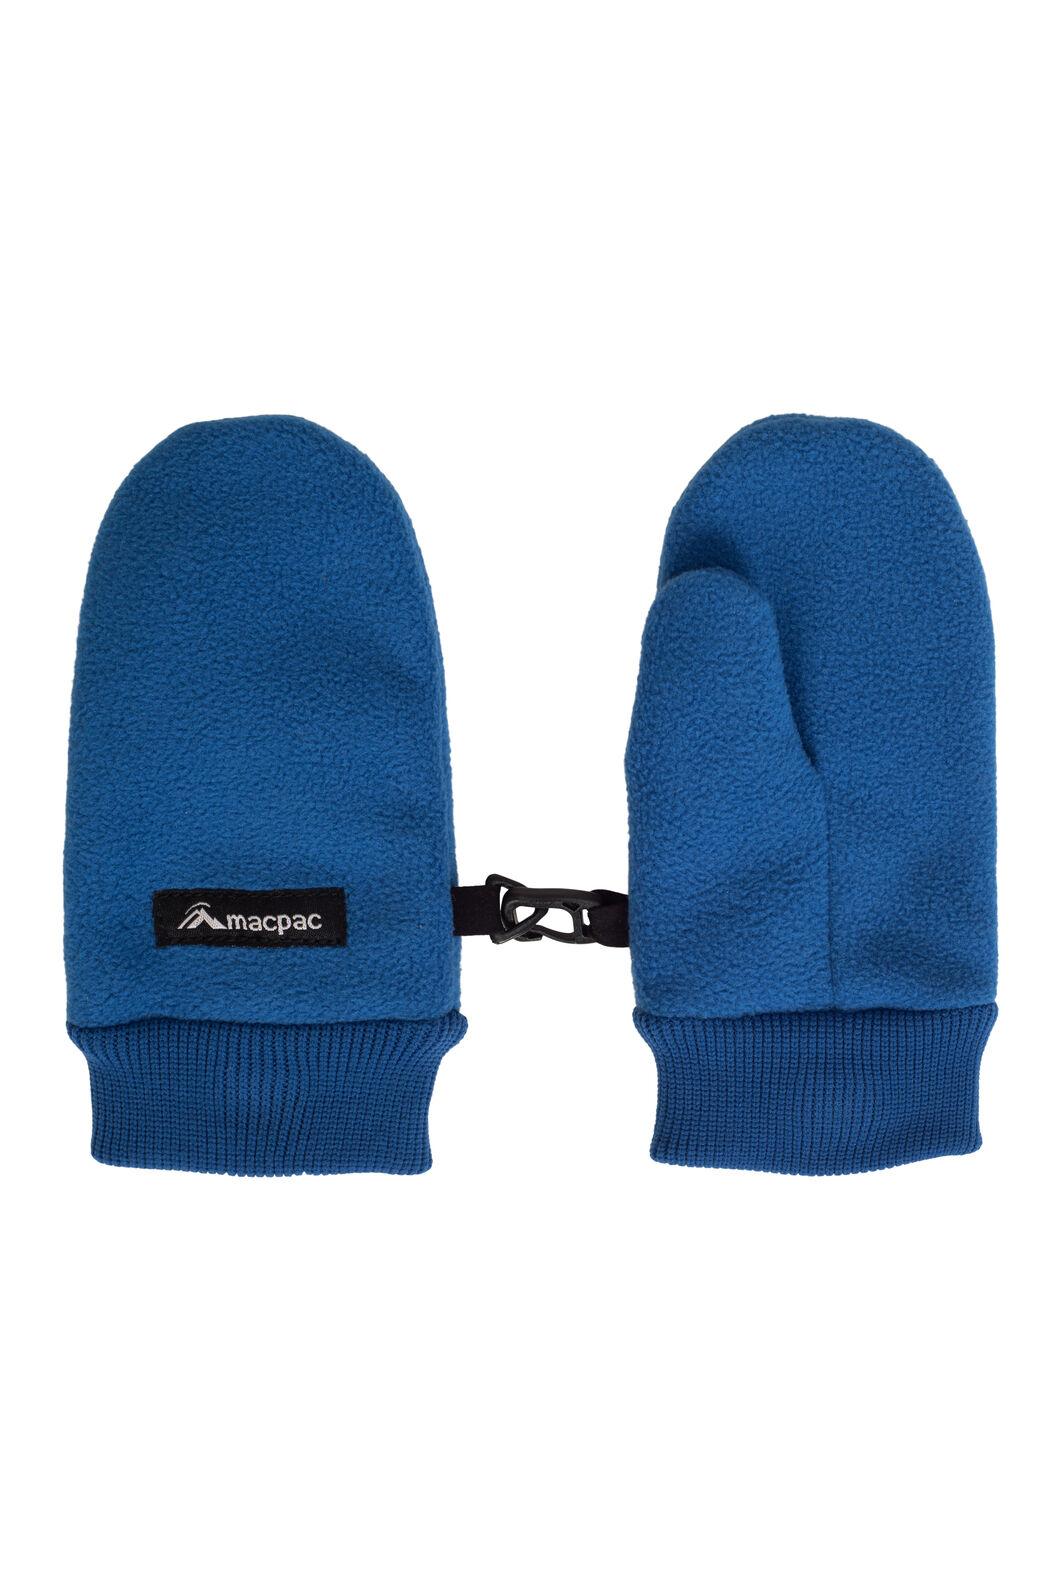 Macpac Kids' Fleece Mittens, Classic Blue, hi-res